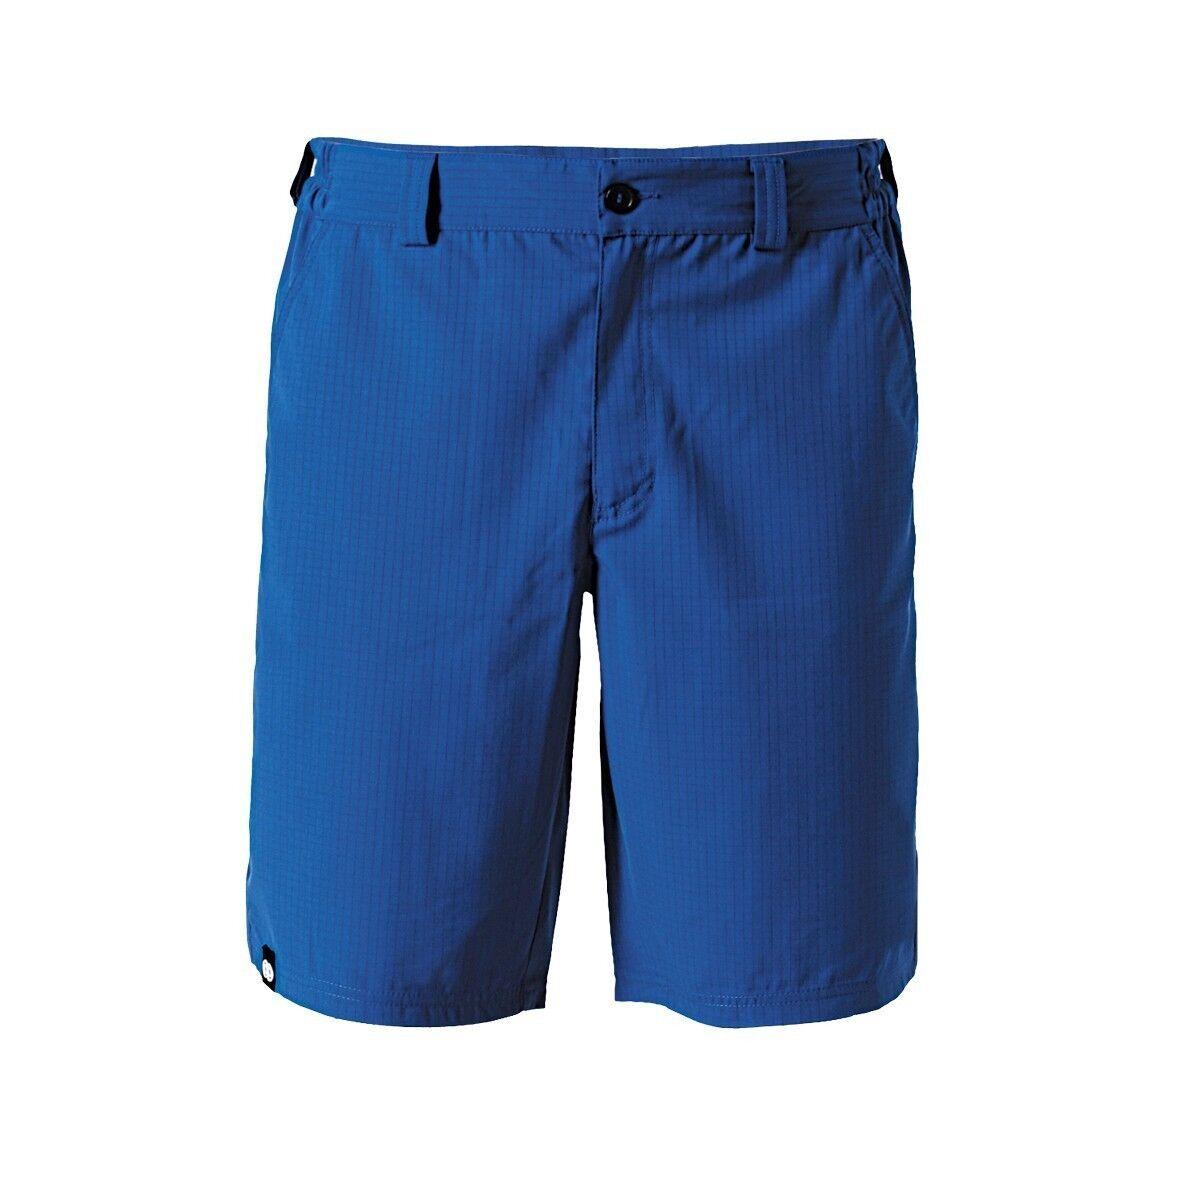 rojoA rewoolution Coast, Ligero Shorts para Exterior Para Hombre AUS MERINO